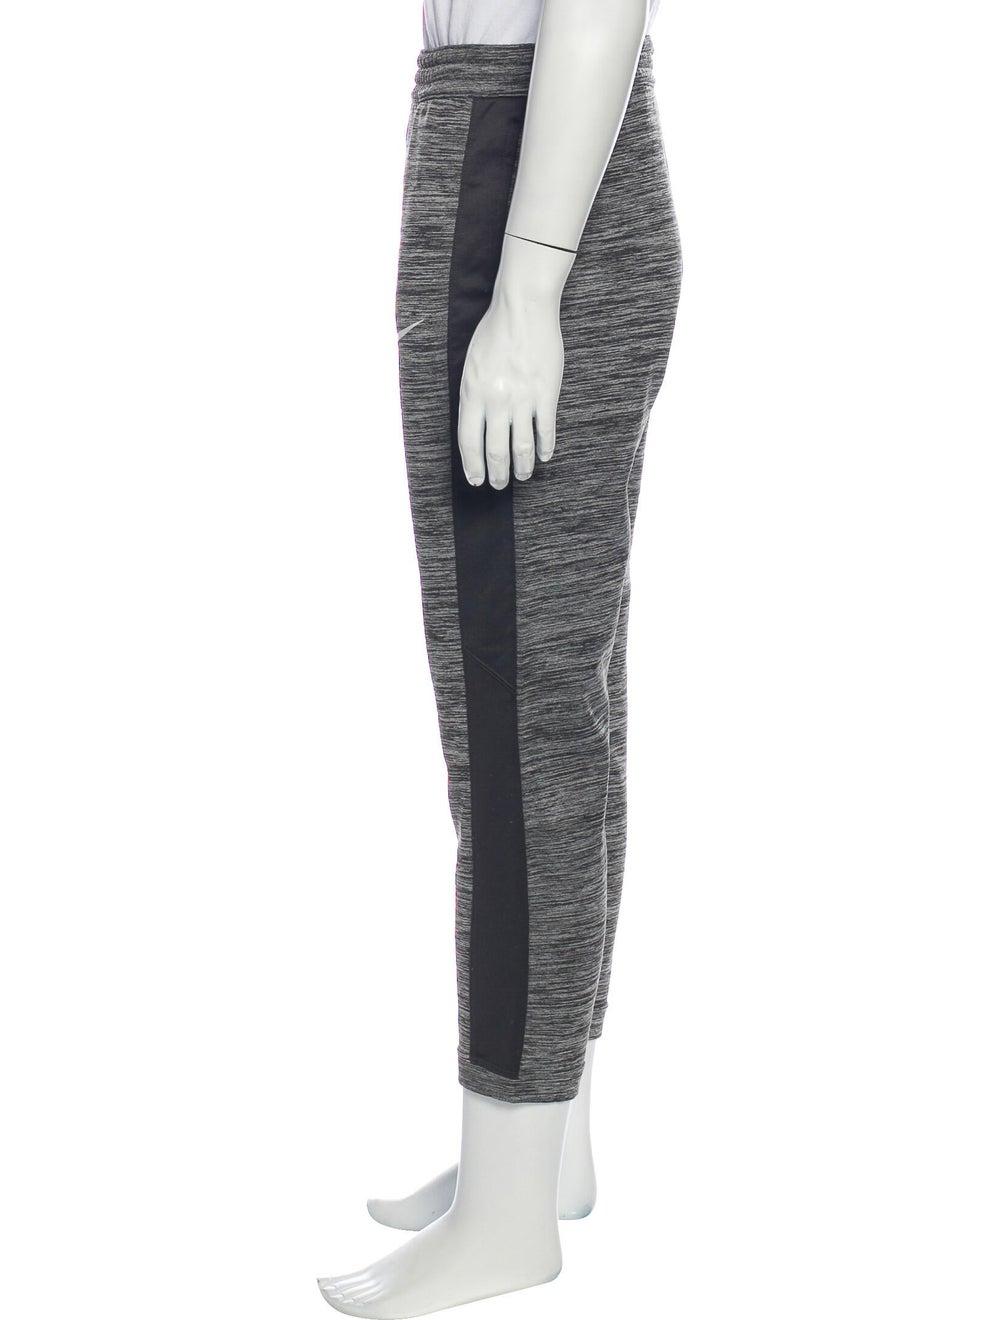 Nike Sweatpants Grey - image 2